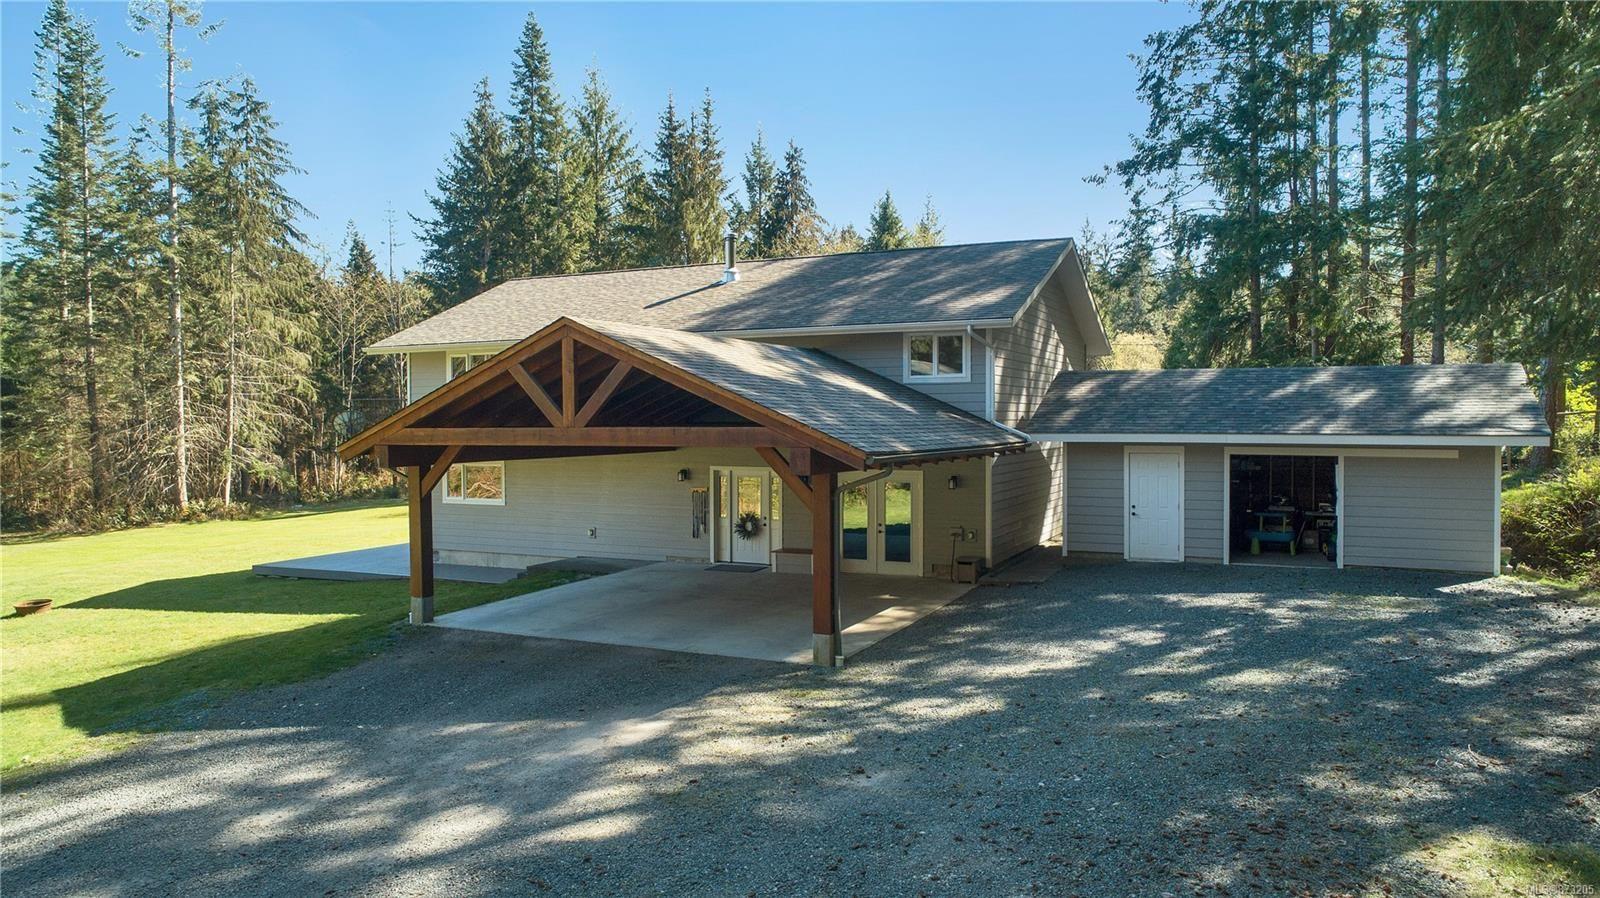 Main Photo: 1114 West Rd in Quadra Island: Isl Quadra Island House for sale (Islands)  : MLS®# 873205